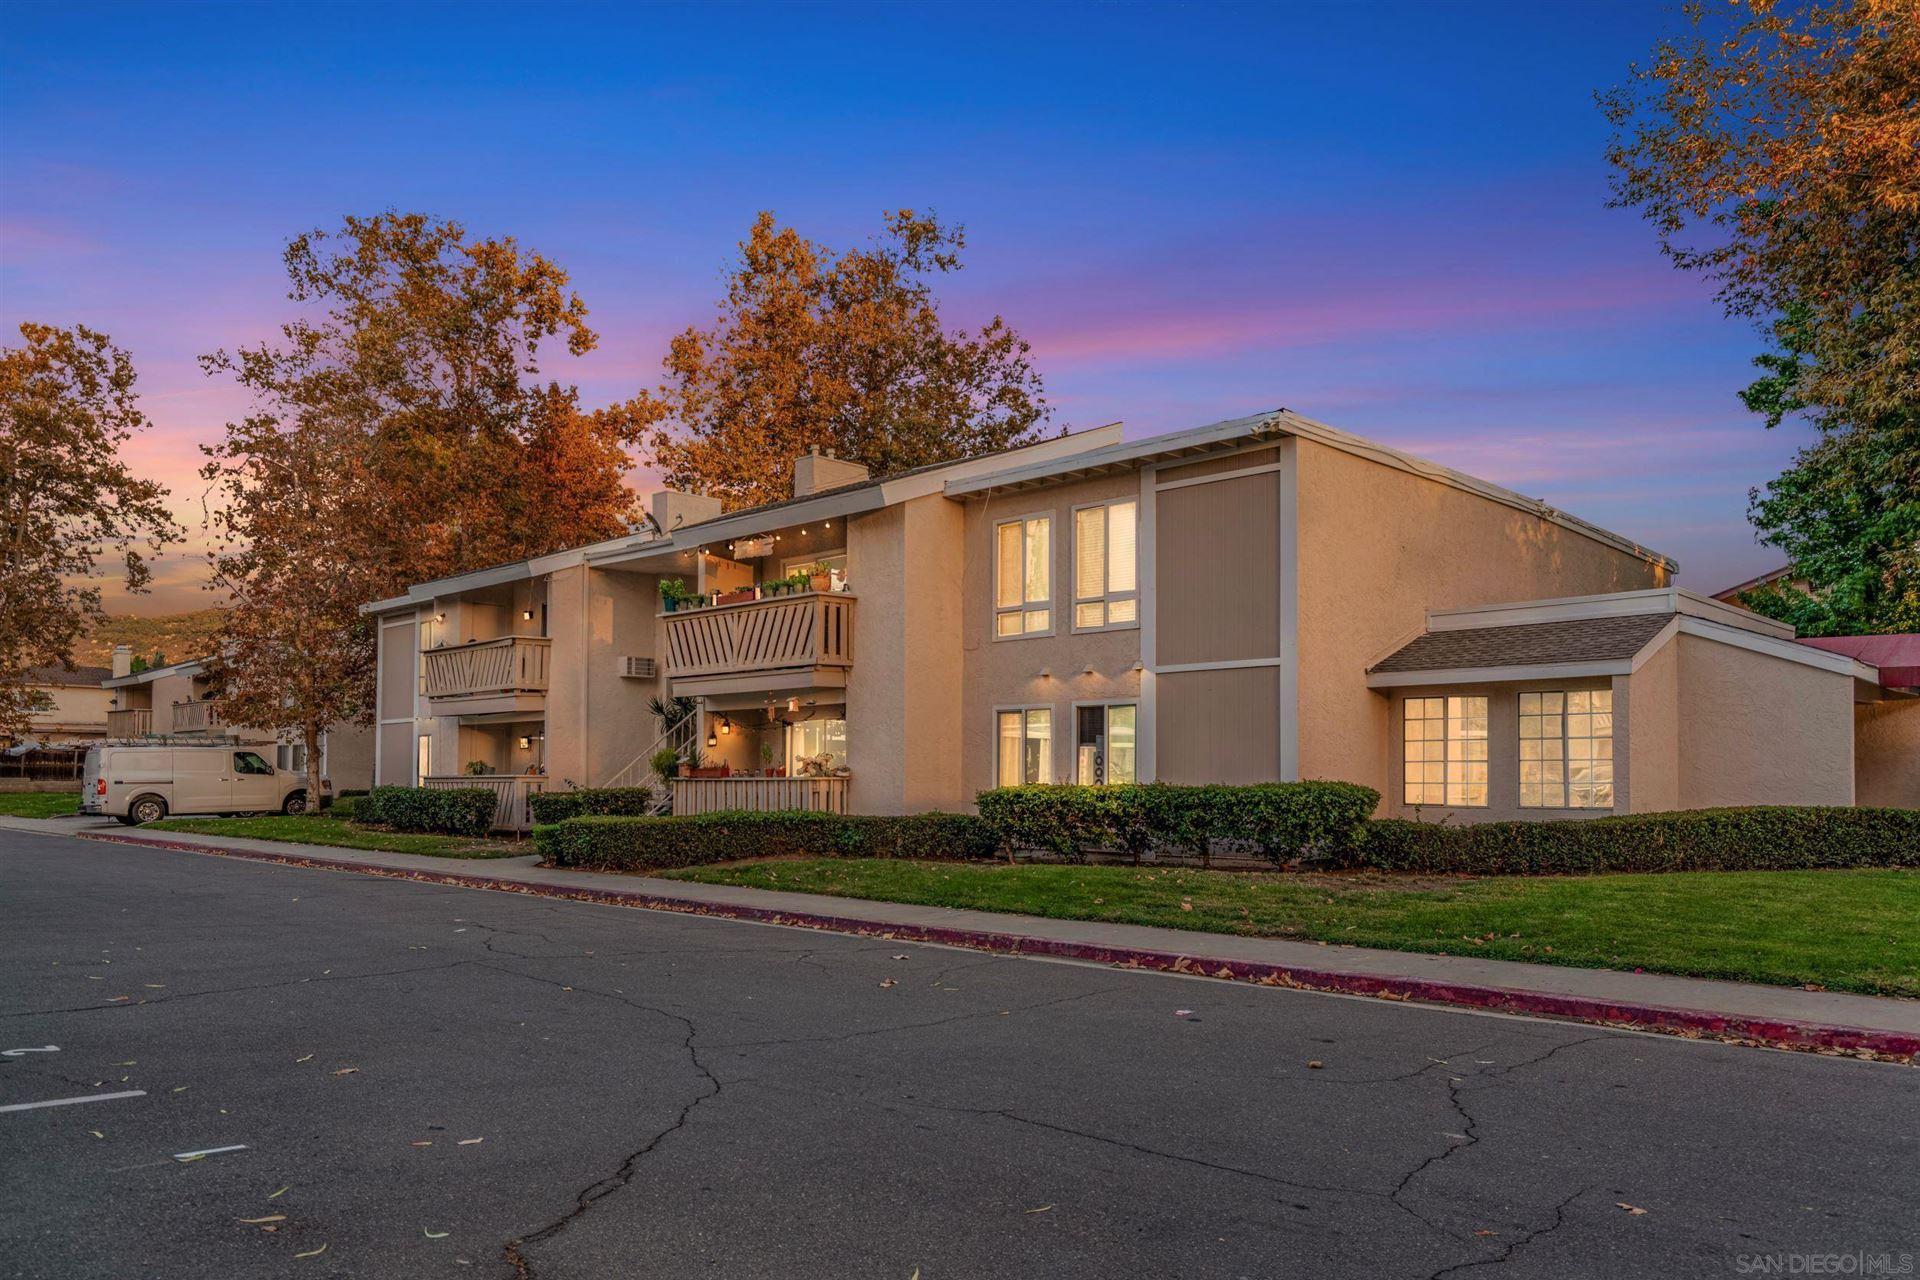 Photo of 512 Sandalwood Pl #4, Escondido, CA 92027 (MLS # 210029144)